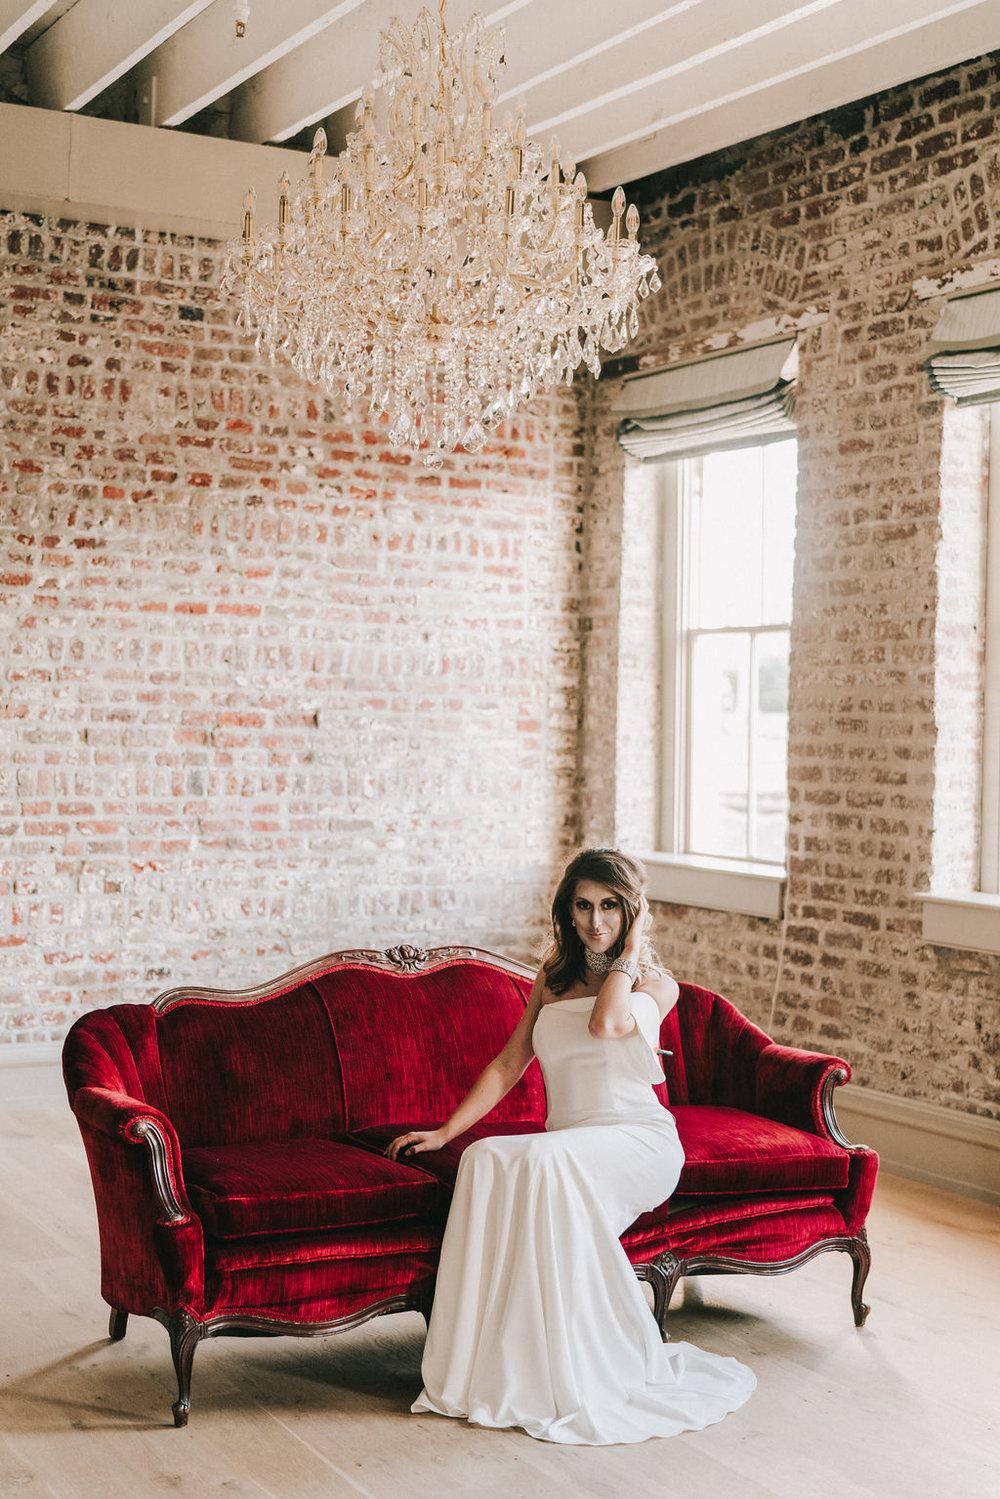 merchants-hall-wedding-inspiration-7.jpg